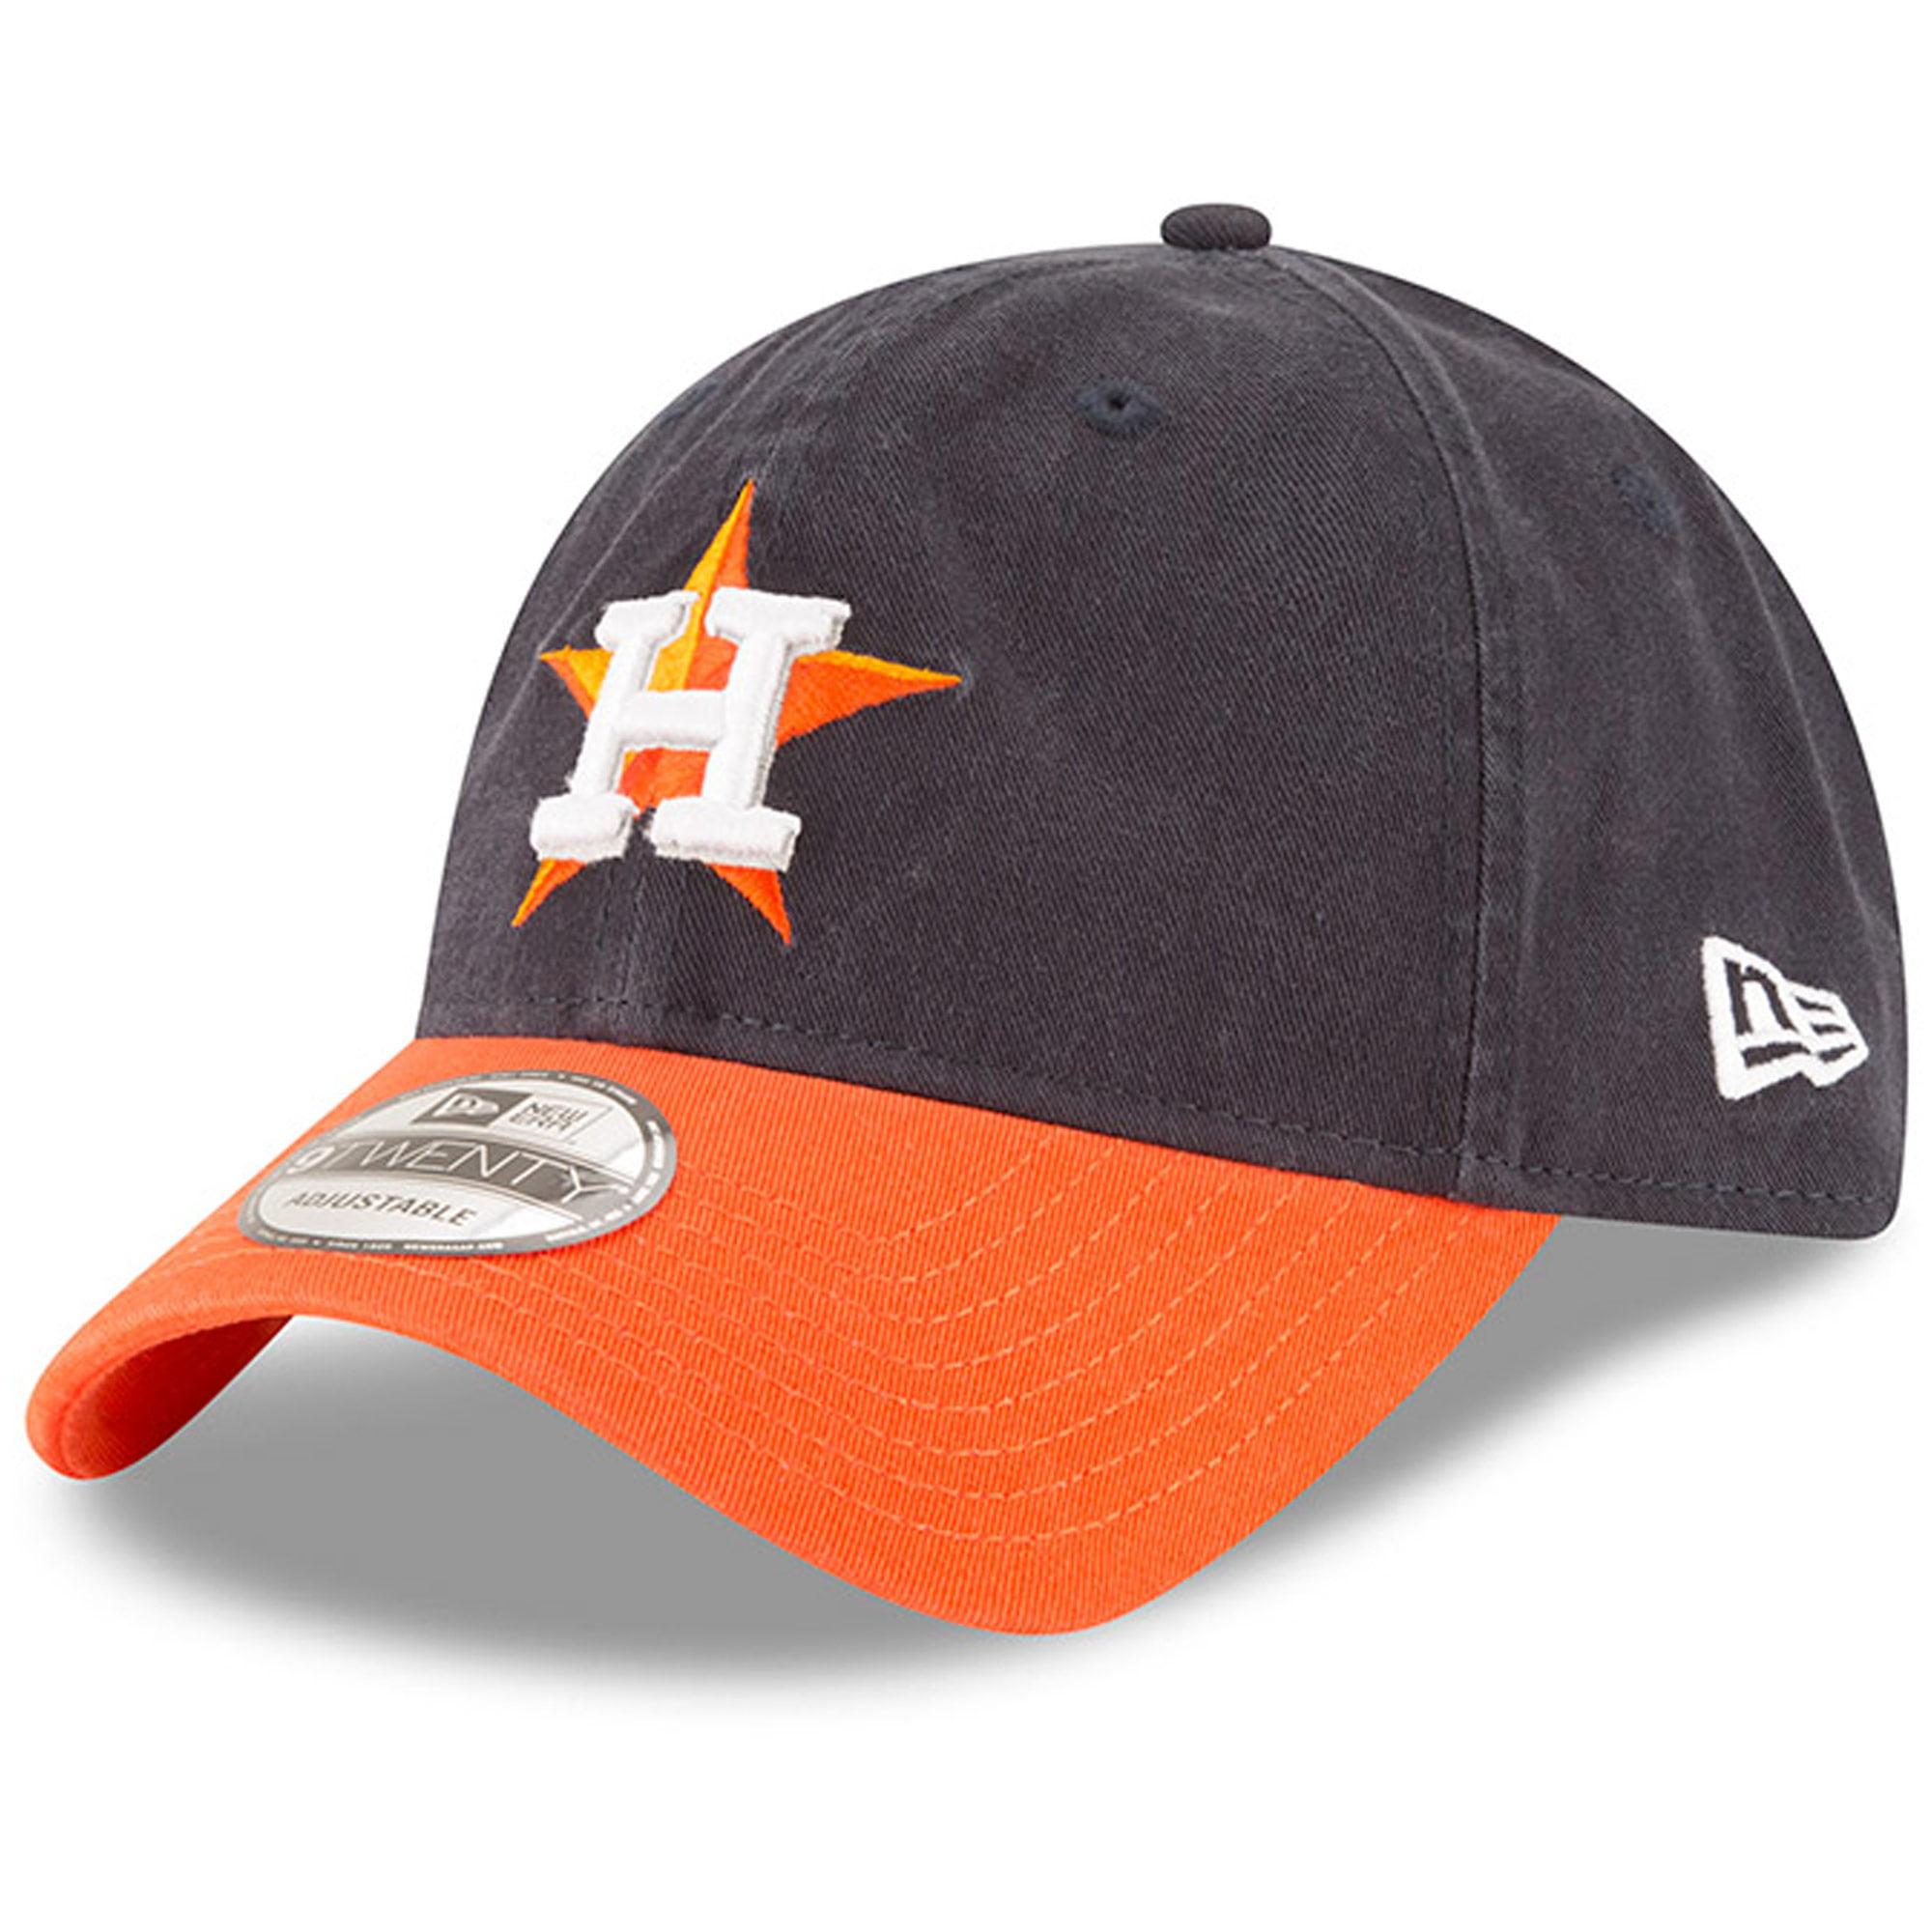 Houston Astros New Era Road Replica Core Classic 9TWENTY Adjustable Hat - Navy/Orange - OSFA